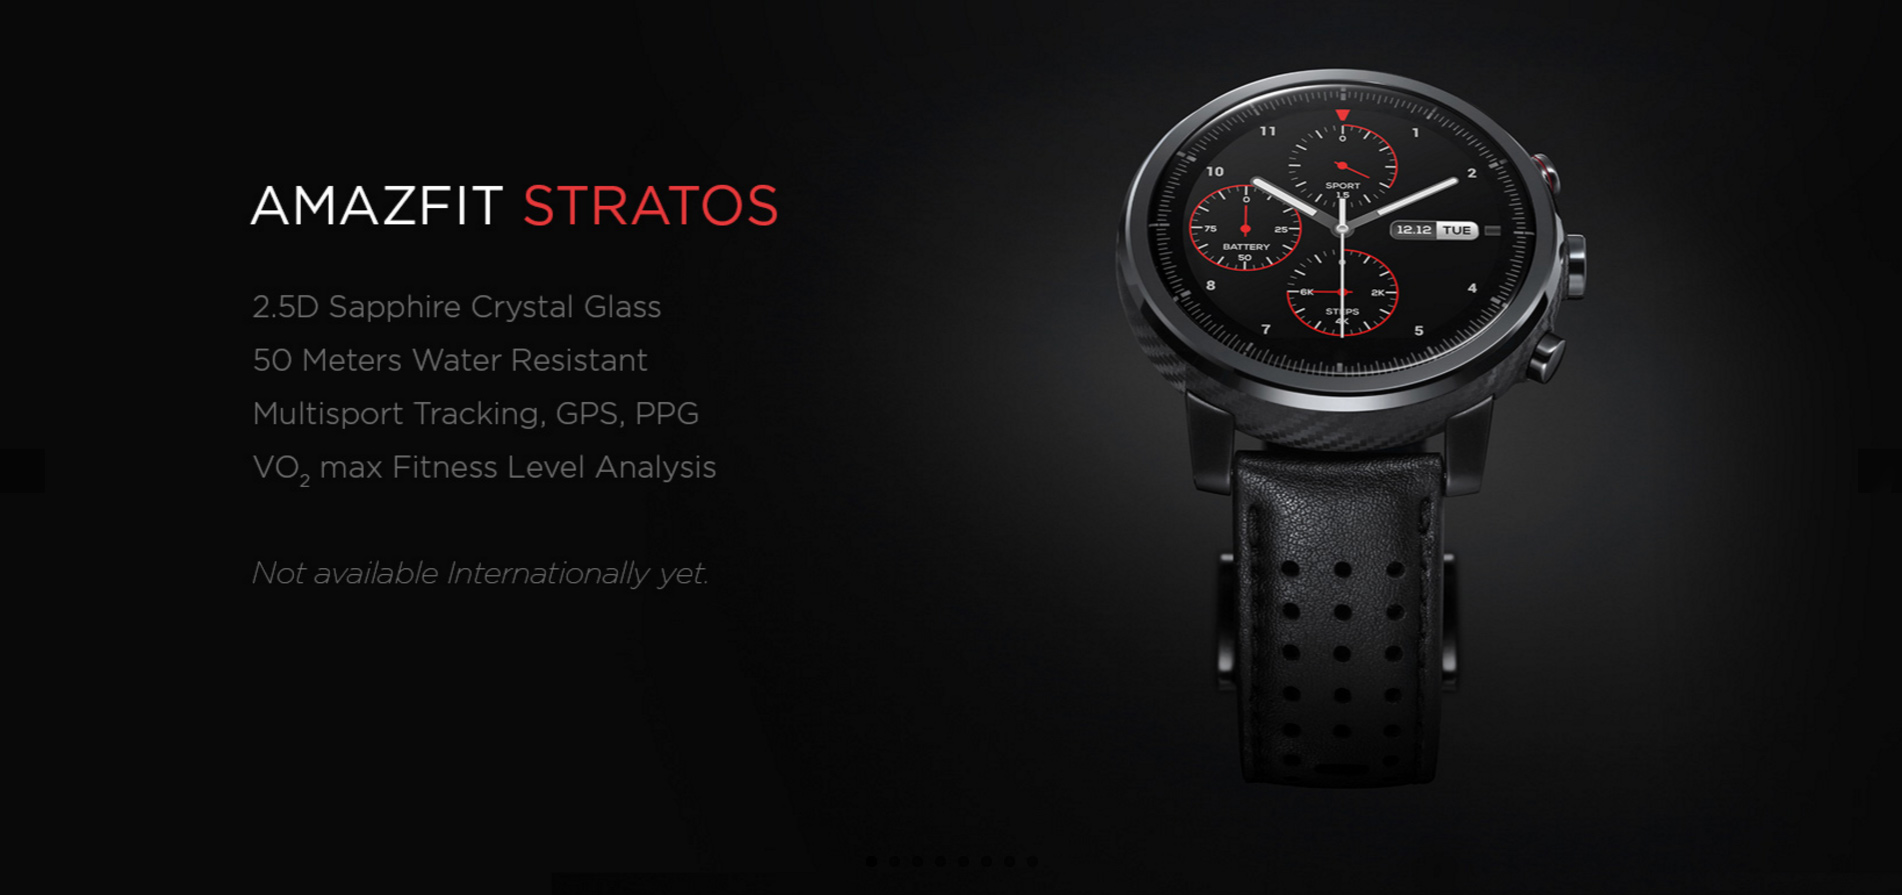 Black Friday: Slevový kupón na Xiaomi Amazfit Stratos Watch 2! [sponzorovaný článek]